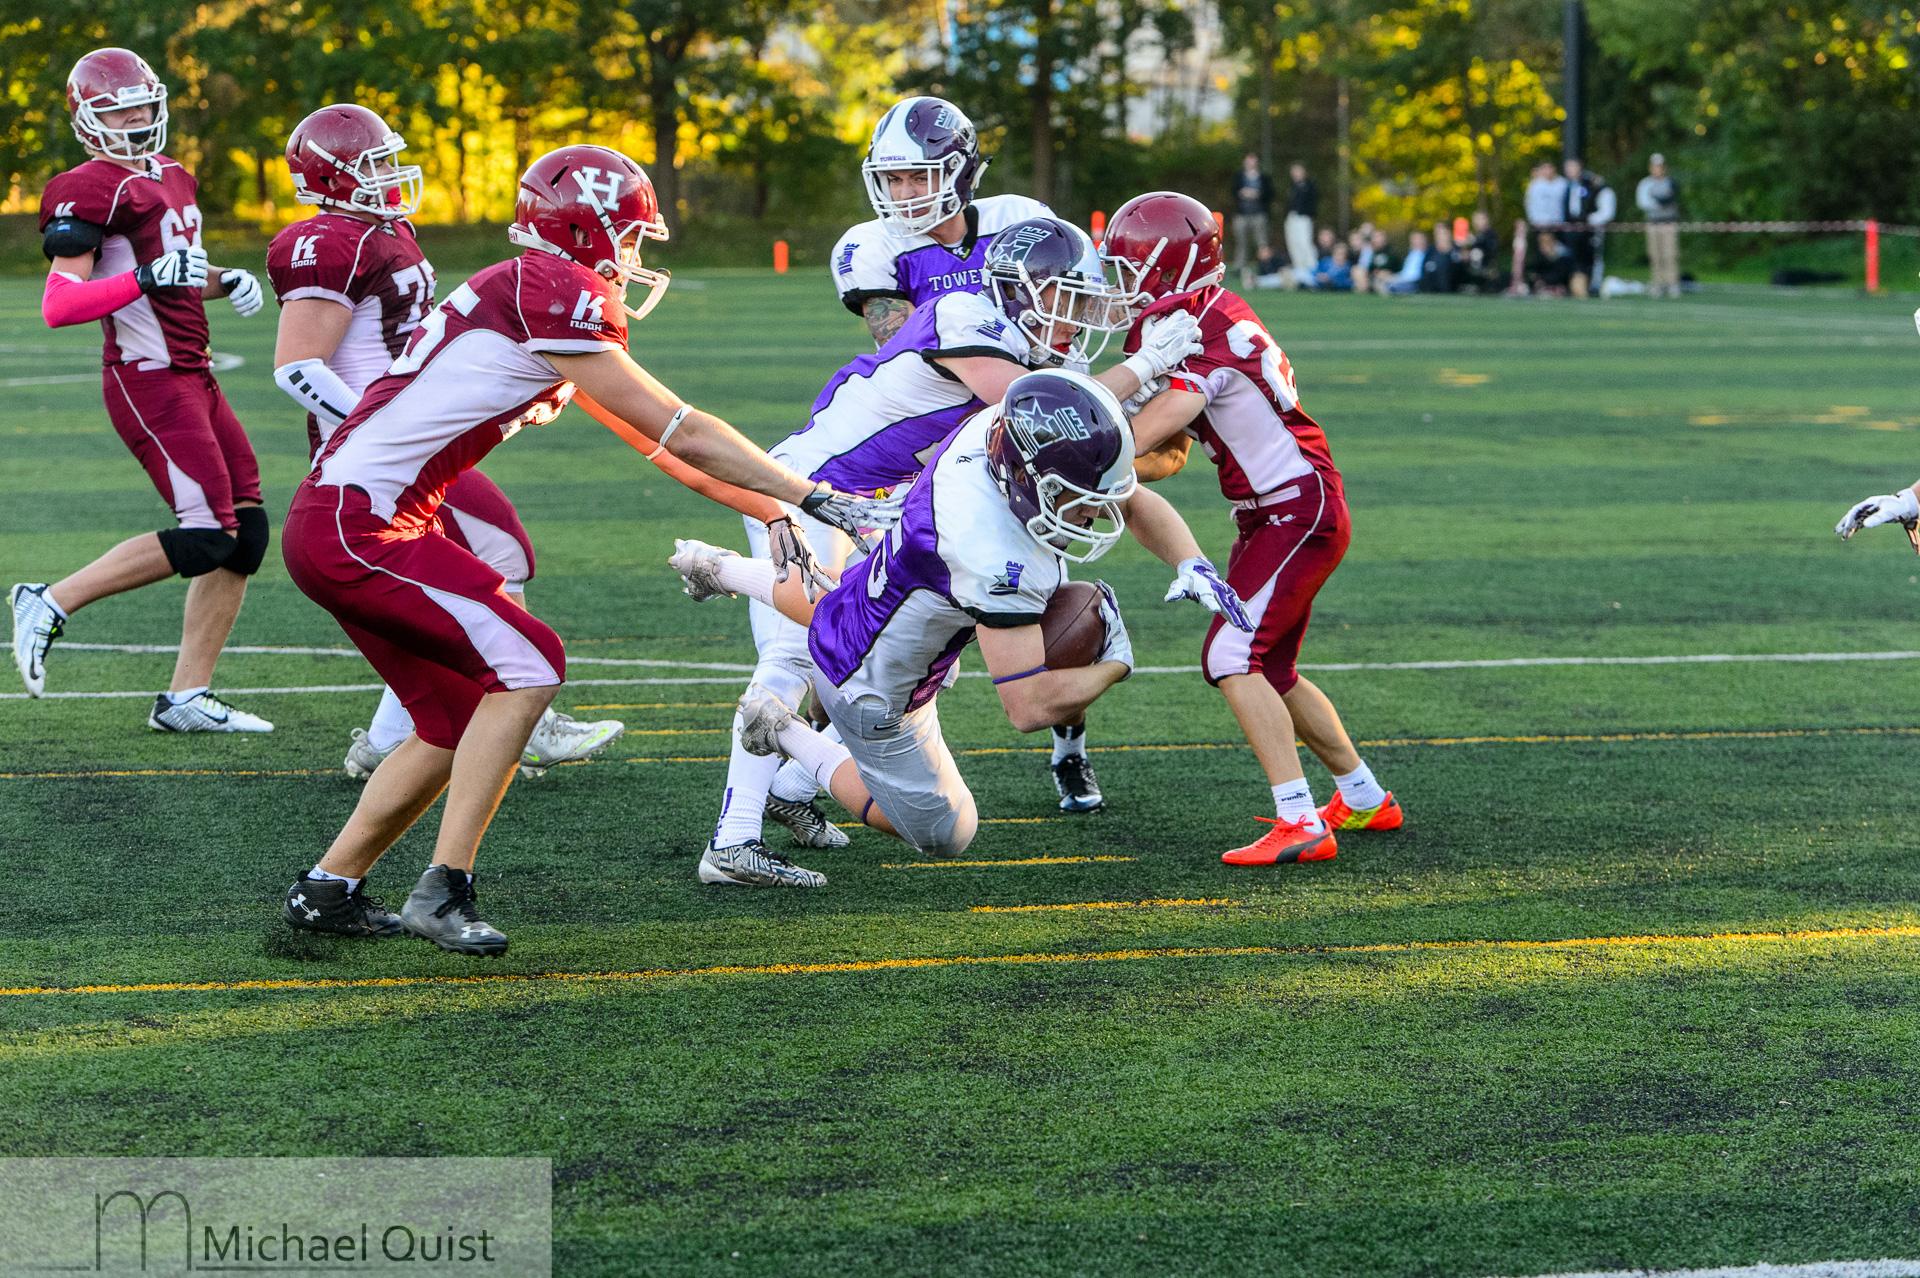 Junior-Bowl-2015-Copenhagen-Towers-vs-Herlev-Rebels-76